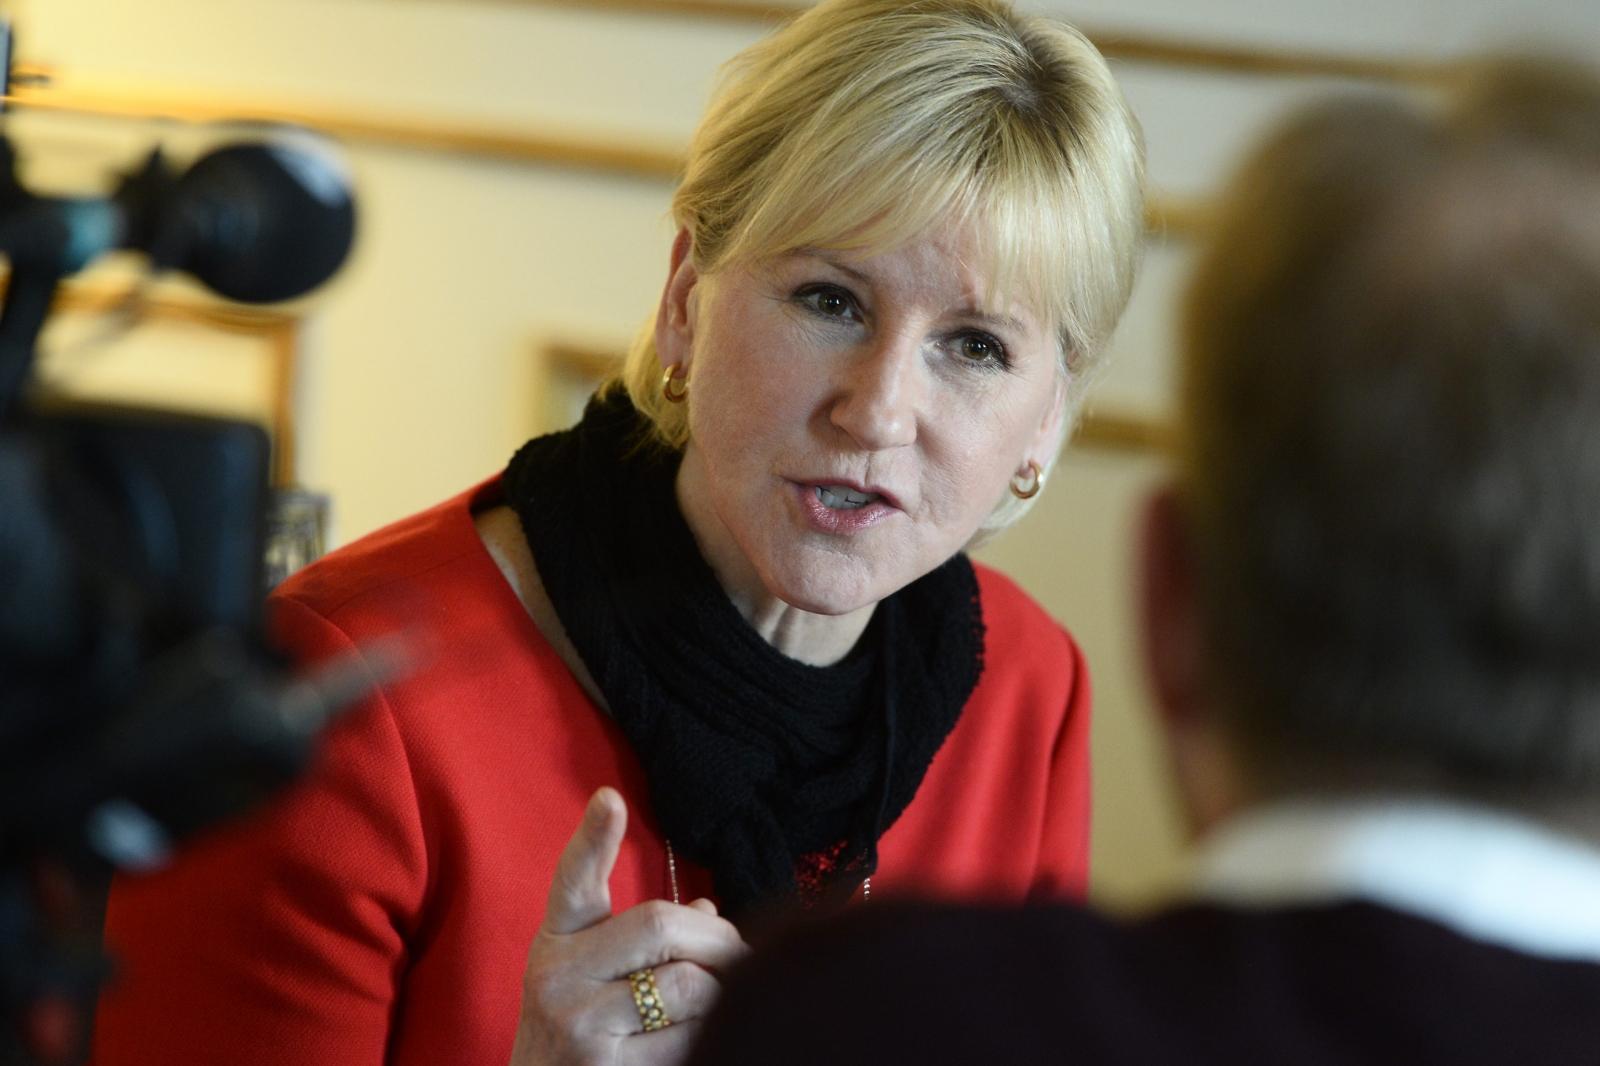 Swedish Foreign Minister Margot Wallstrom Saudi